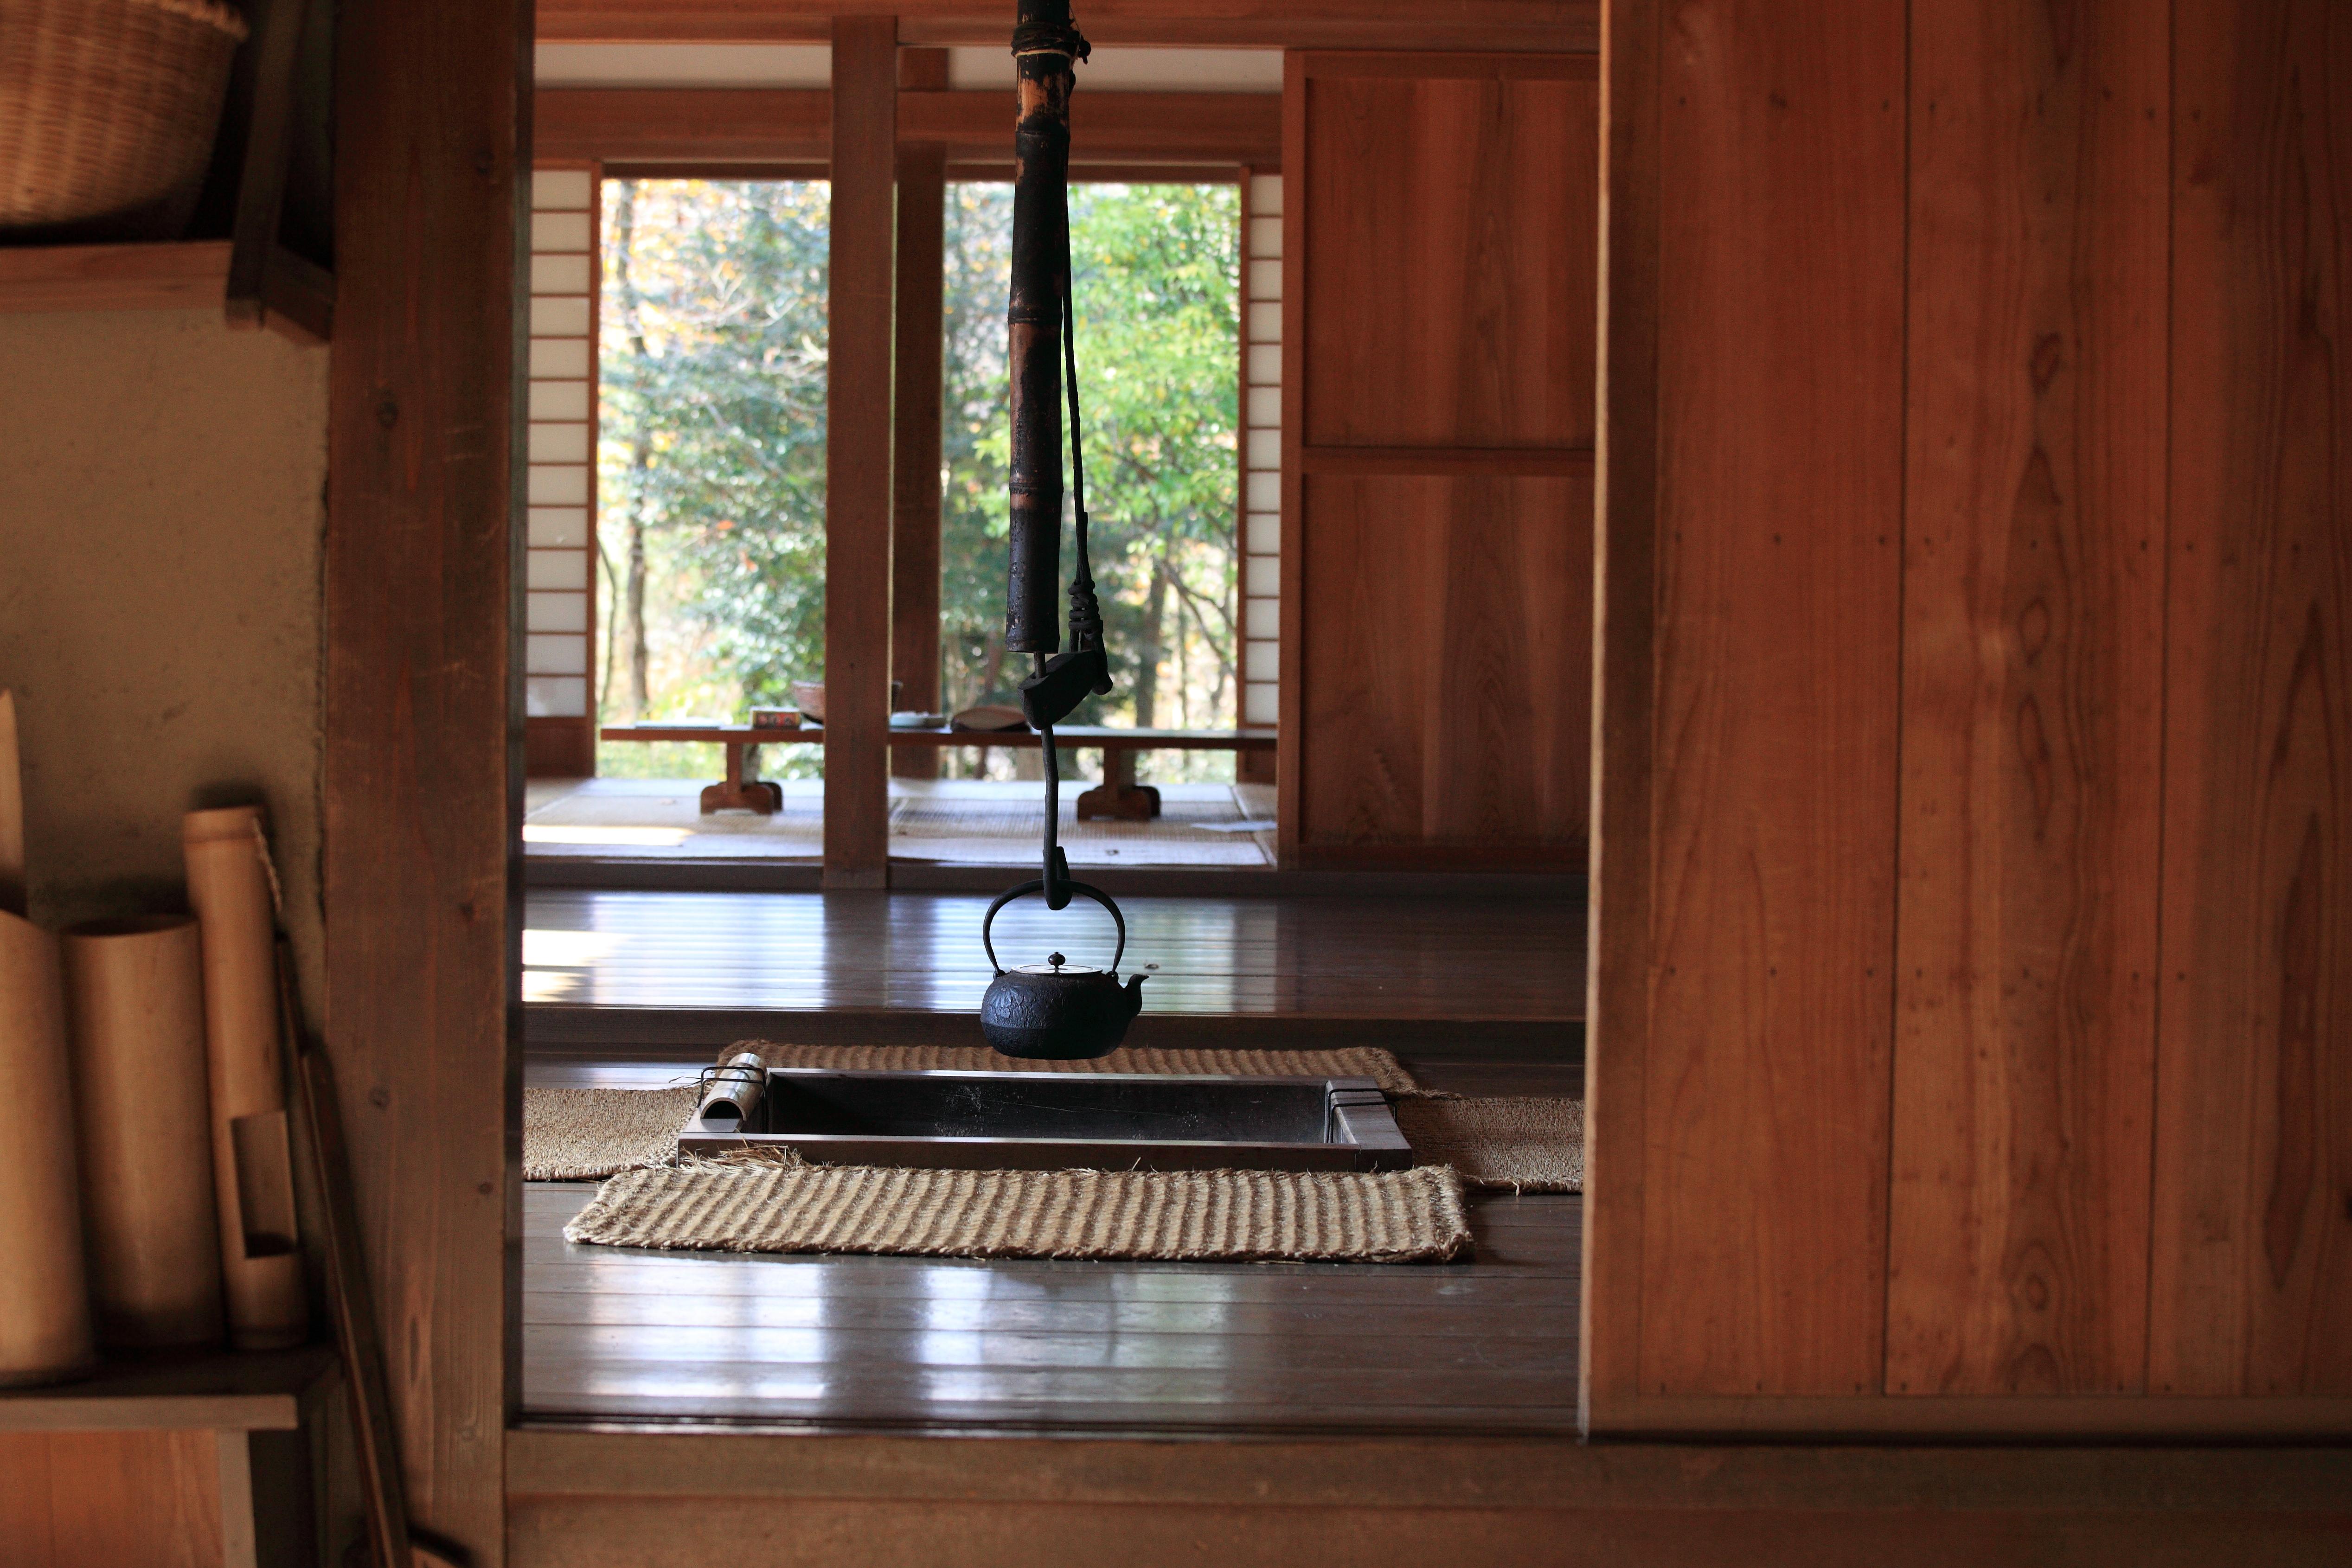 Gambar Arsitektur Tanah Pertanian Rumah Lantai Pedalaman